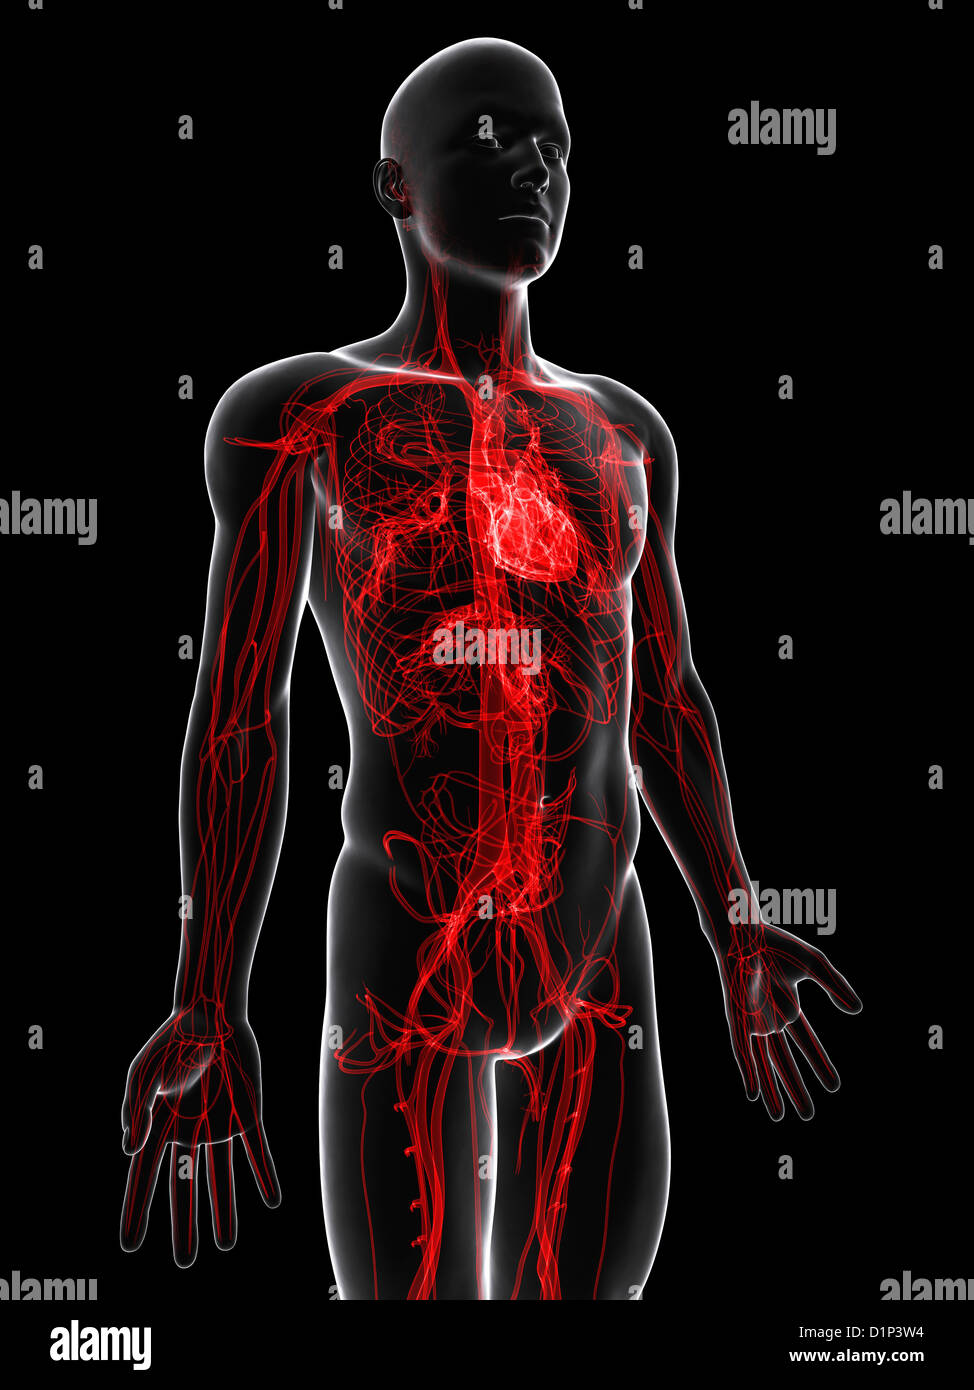 Cardiovascular system, artwork - Stock Image